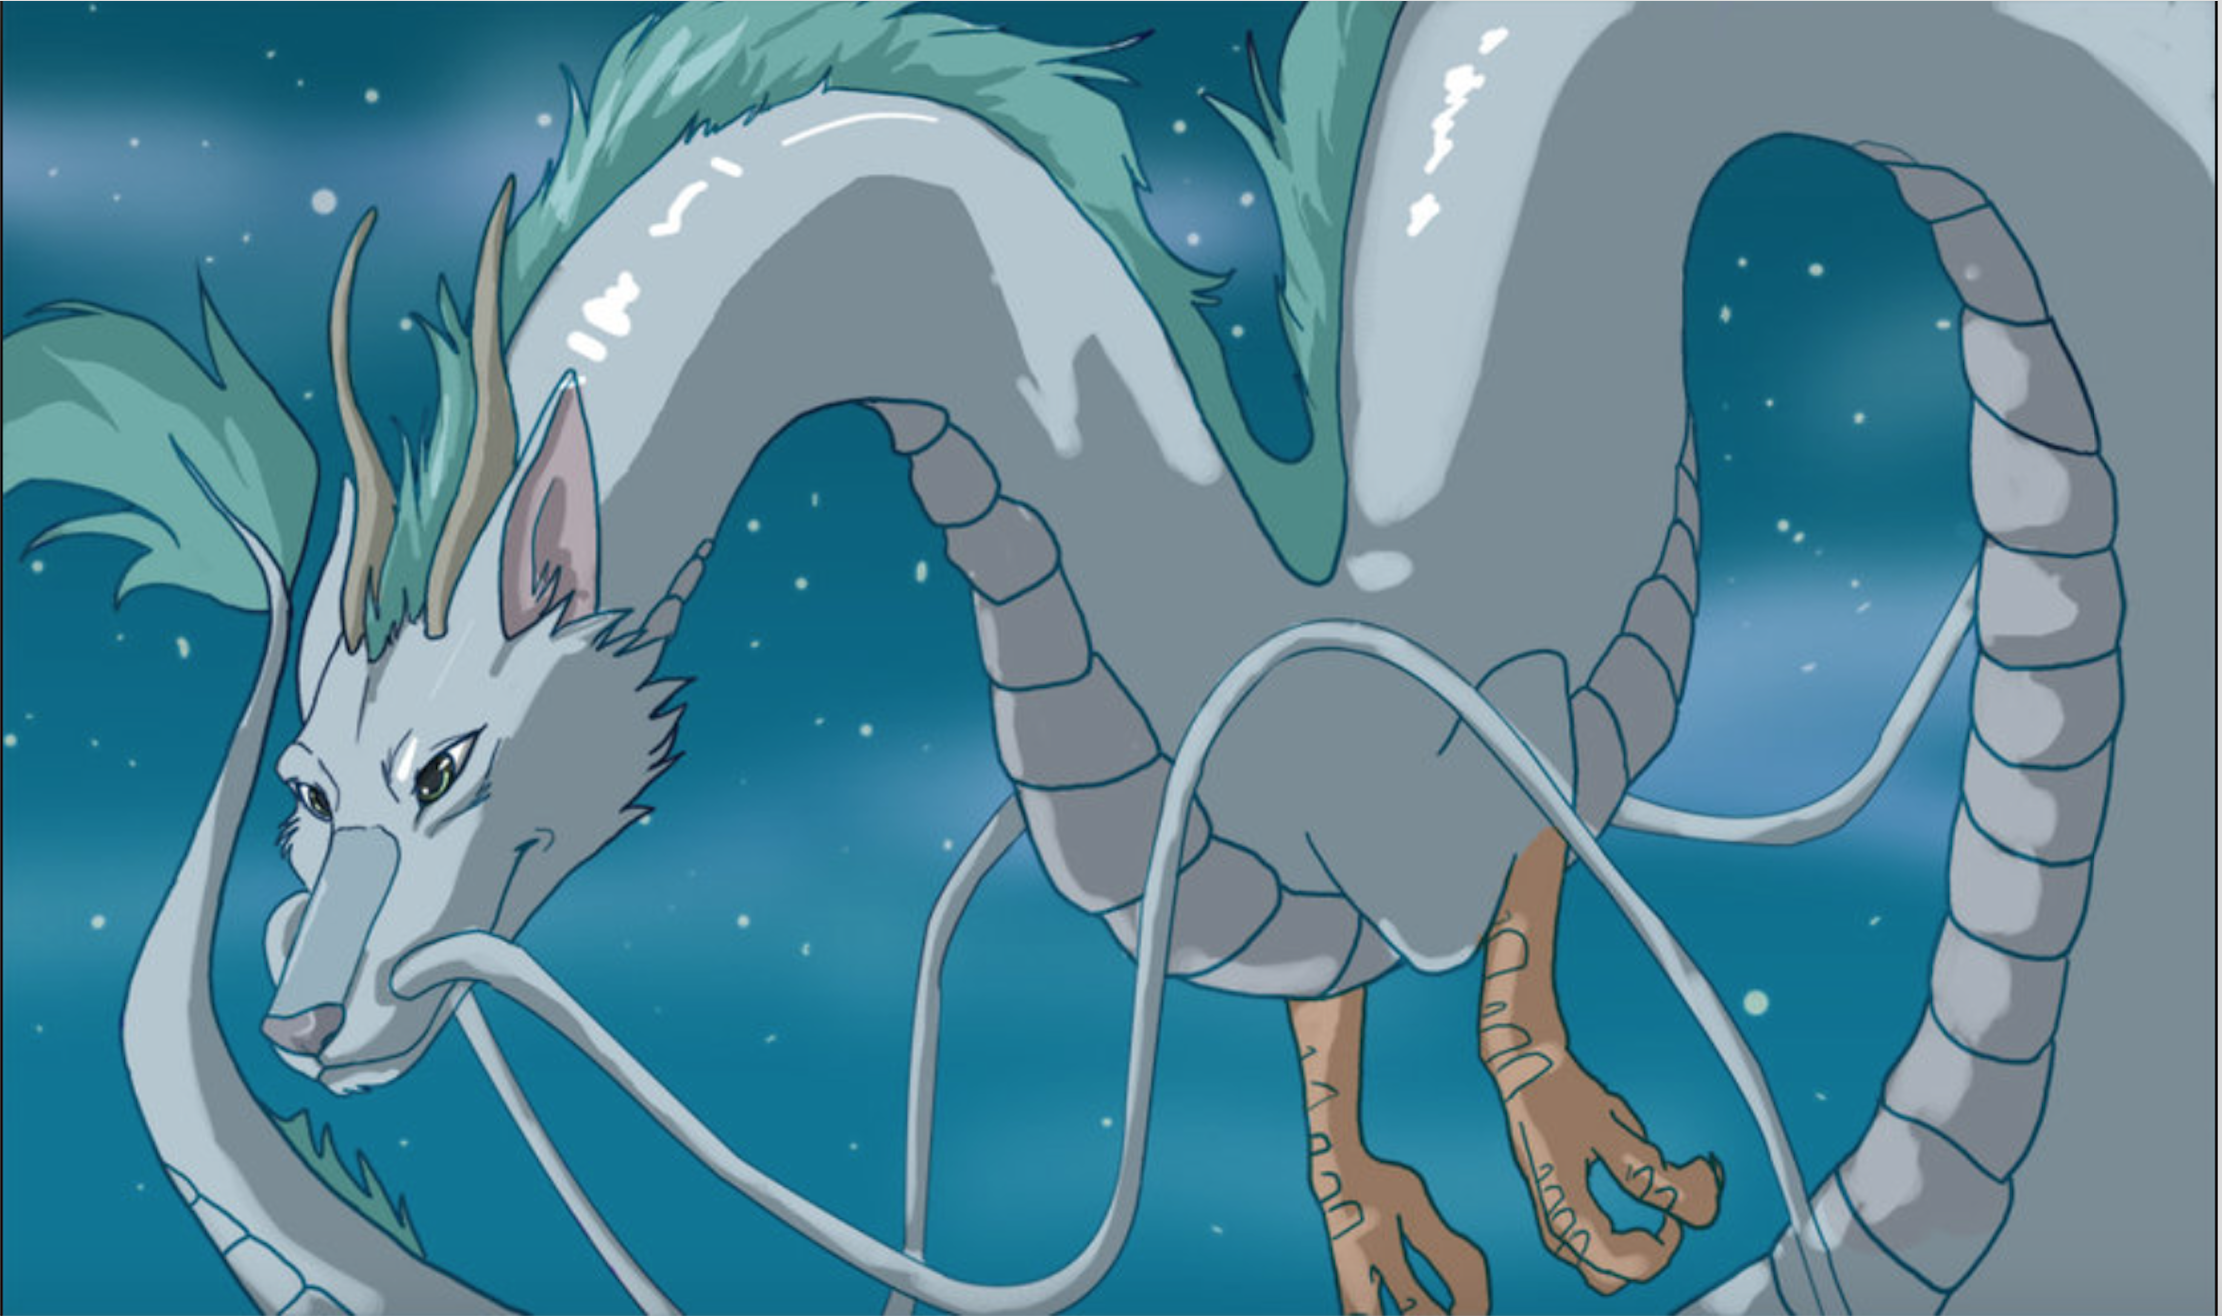 Haku The Dragon Flying In The Sky Of Sparkling Stars Funny Anime Pics Studio Ghibli Dragon Icon